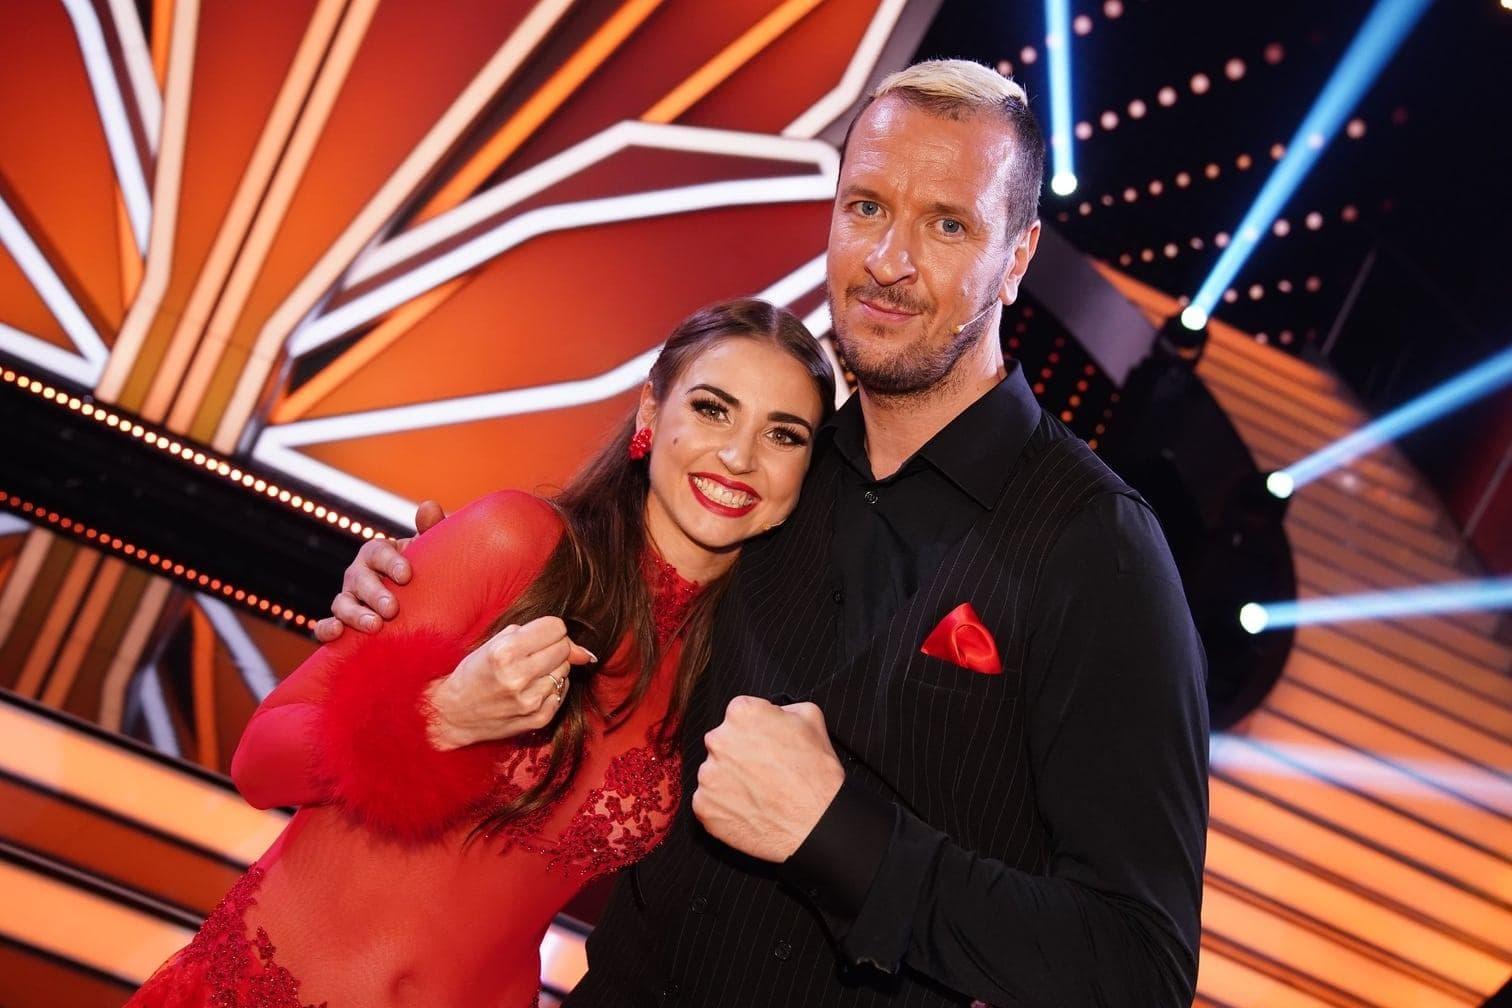 <p>Ex-Handballprofi Pascal Hens tanzt mit Ekaterina Leonova.</p> Foto: TVNOW / Gregorowius